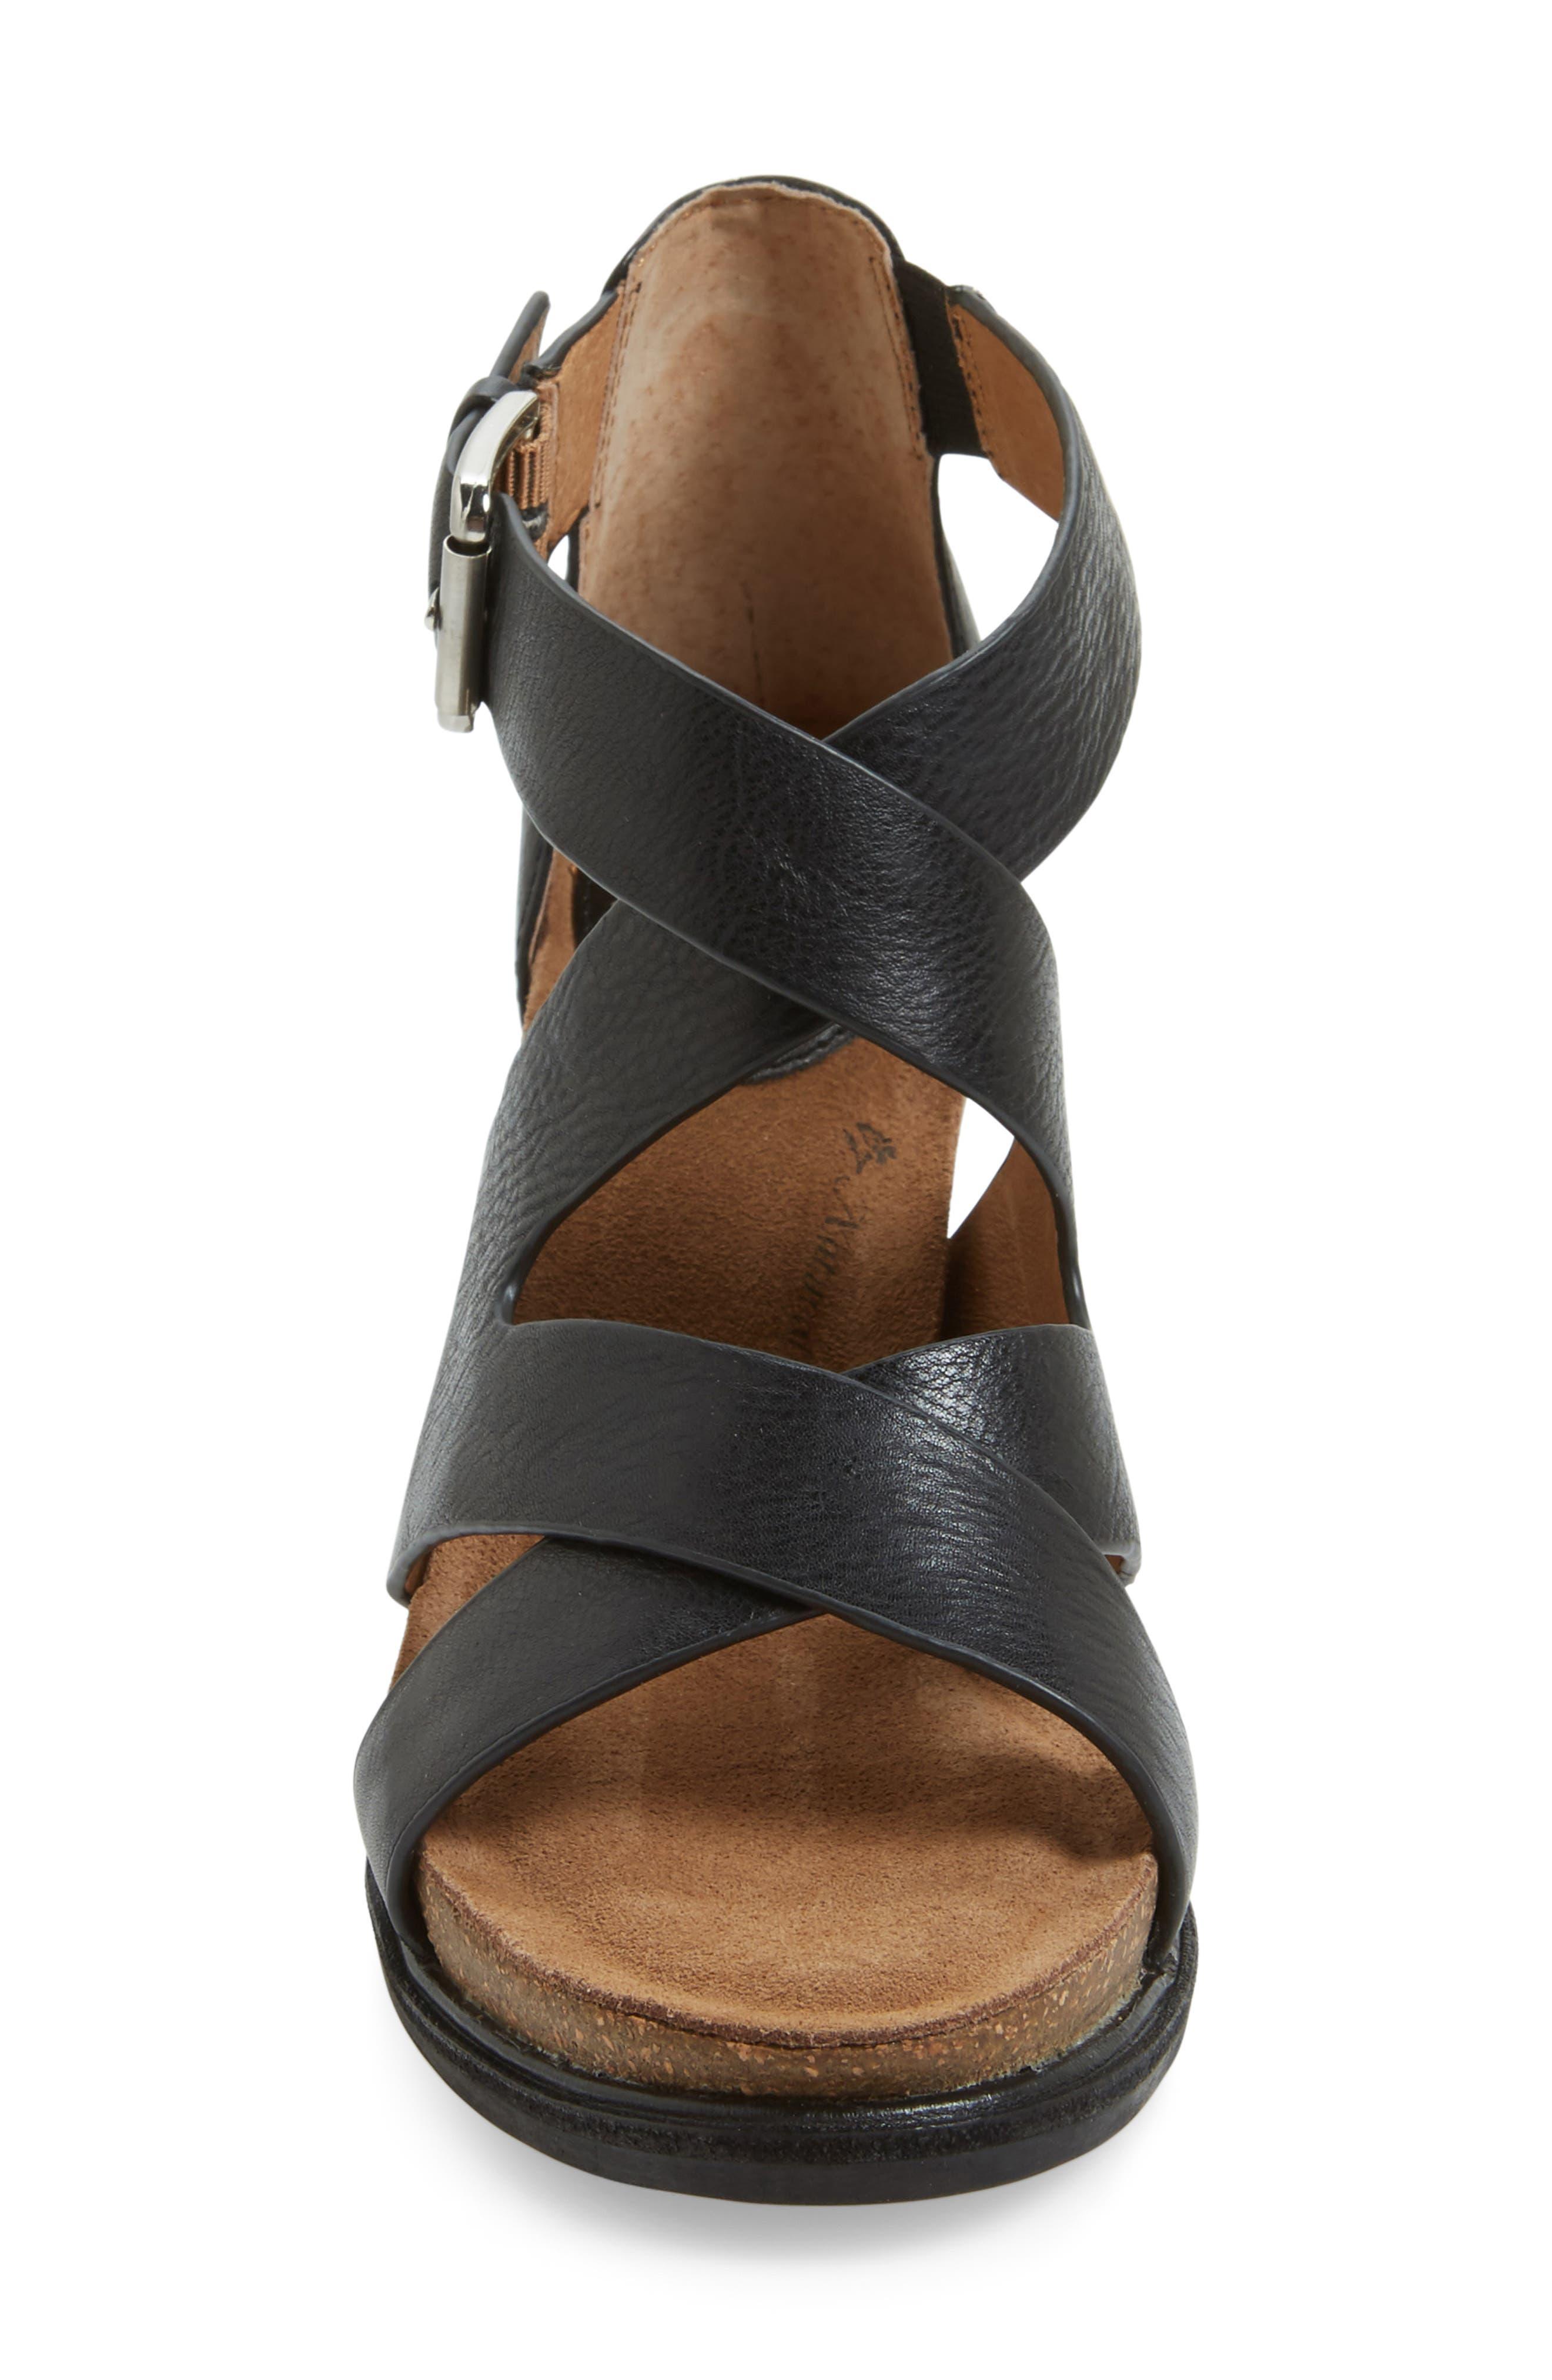 Canita Block Heel Sandal,                             Alternate thumbnail 3, color,                             Black Leather